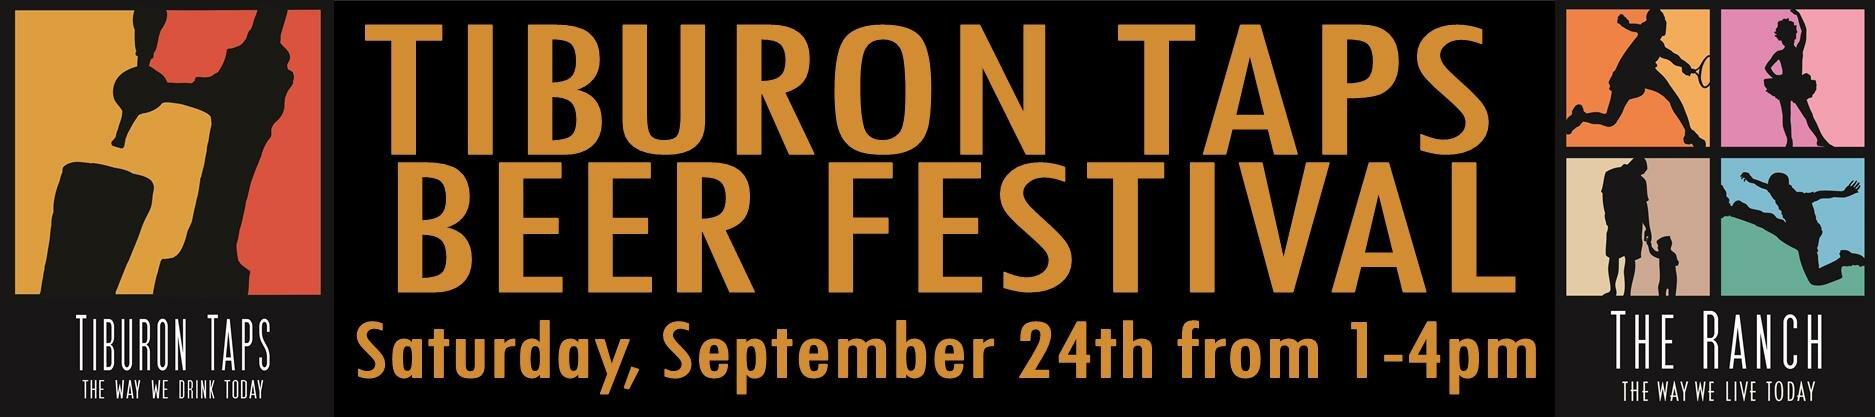 Tiburon Taps Beer Festival 2016